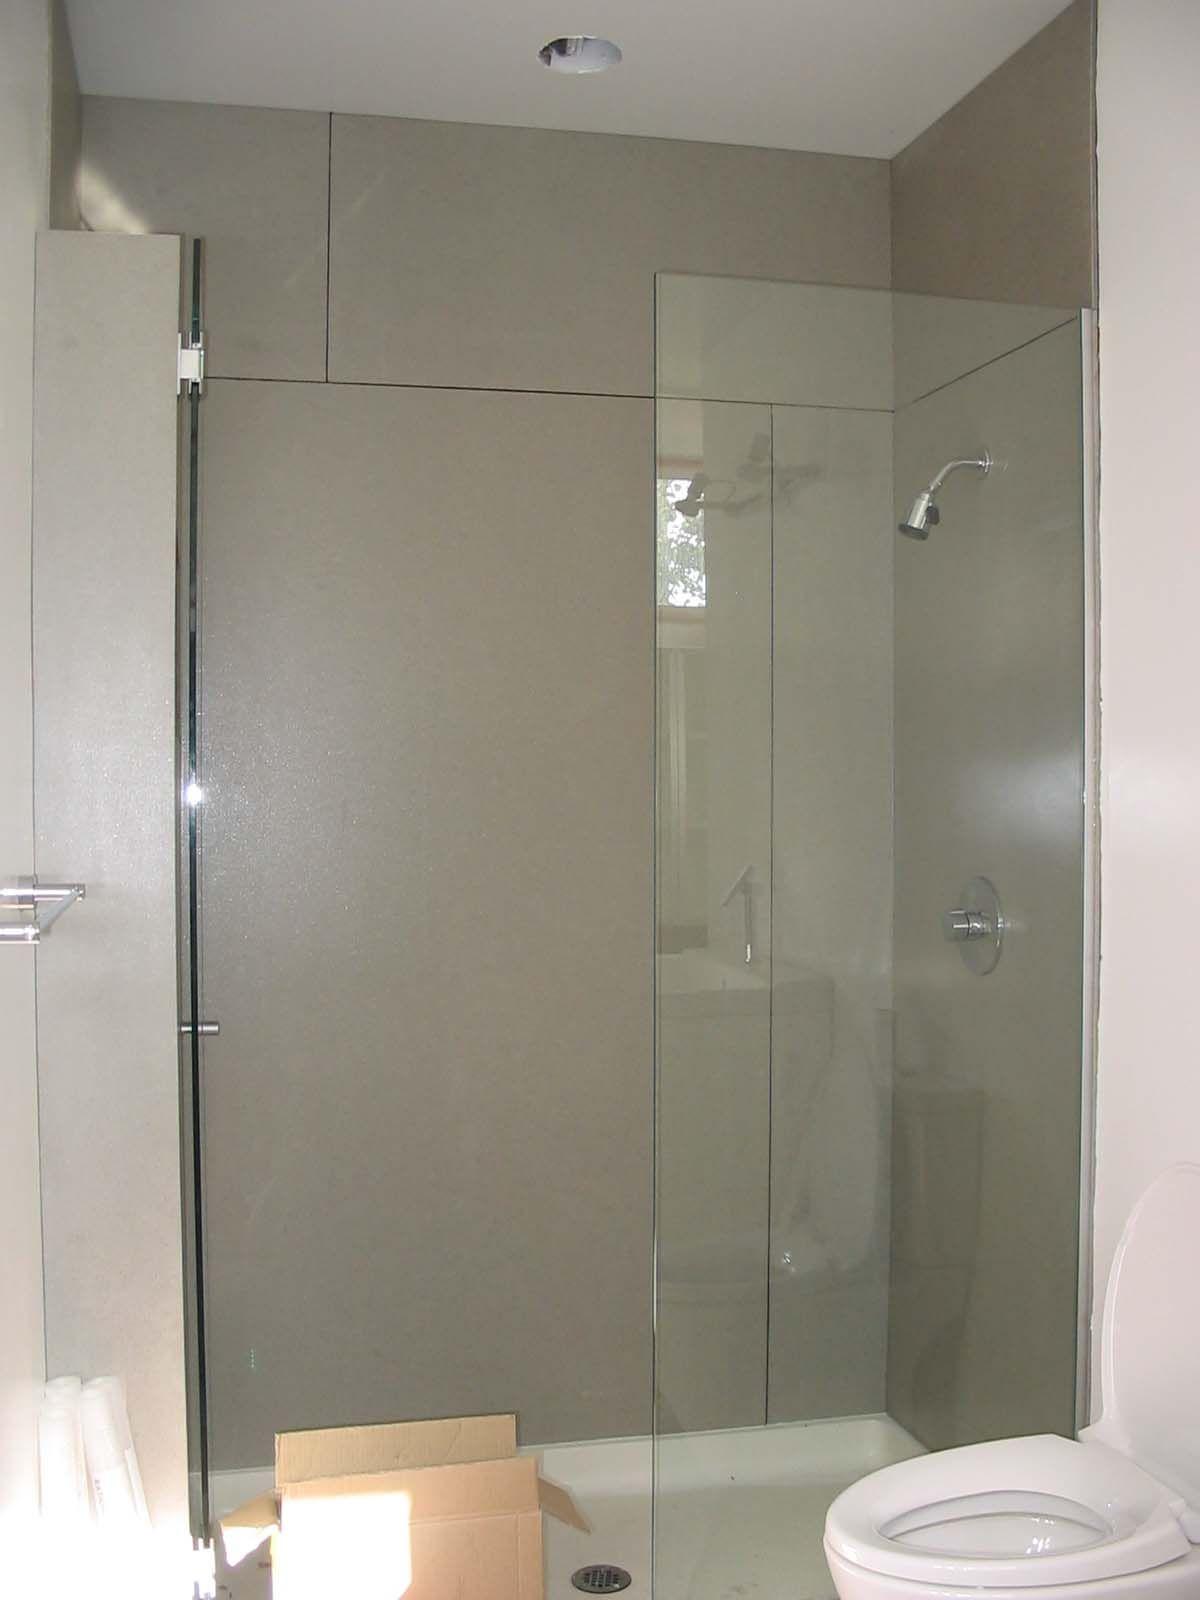 Shower Stall Deco Poz Concrete Shower Shower Wall Concrete Bath